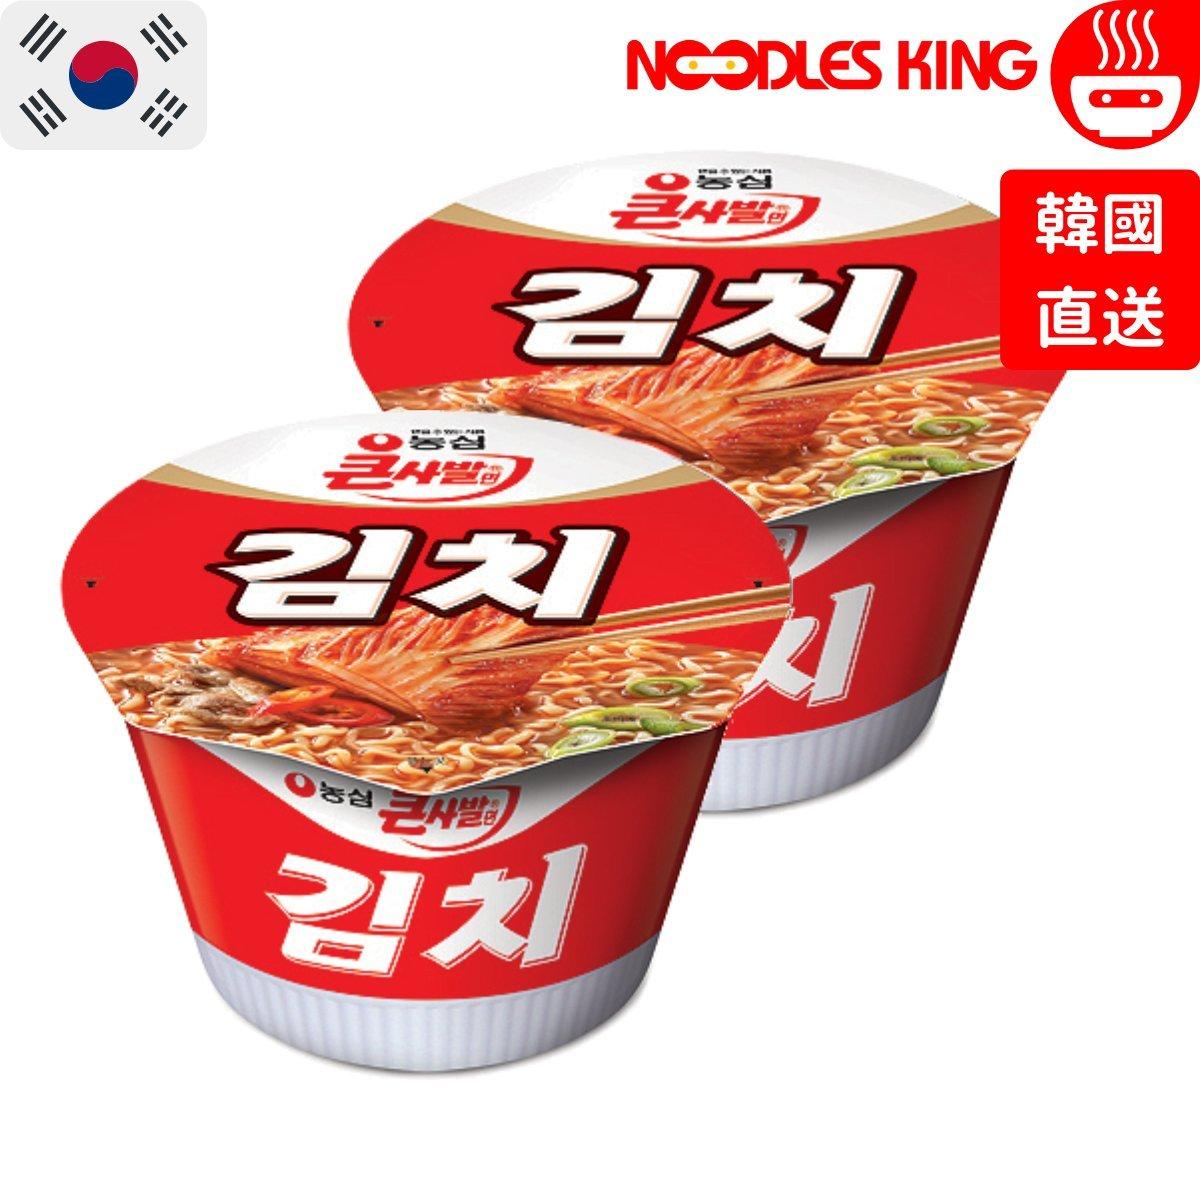 Kimchi Noodles Soup Big Bowl (Korea) 112g x 2